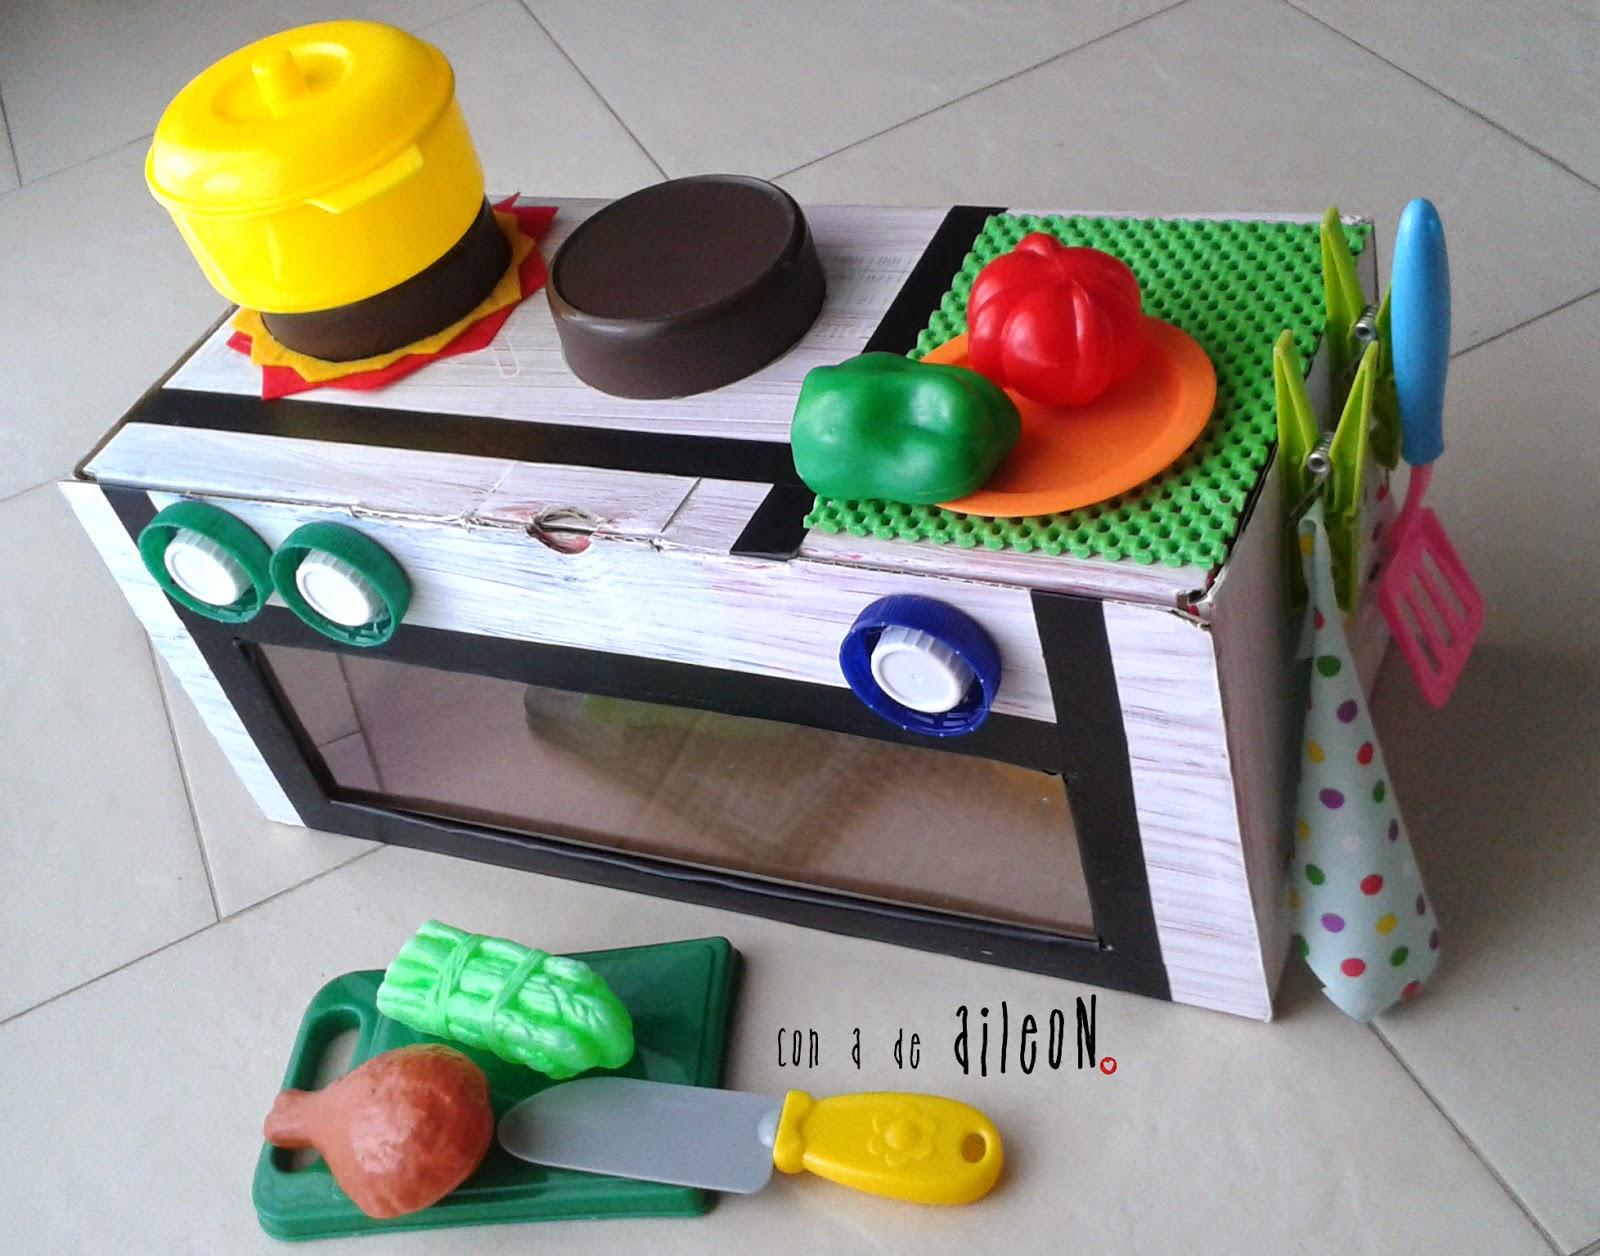 recycled kitchen, diy kitchen, children, niños, cocina reciclada, juguete casero